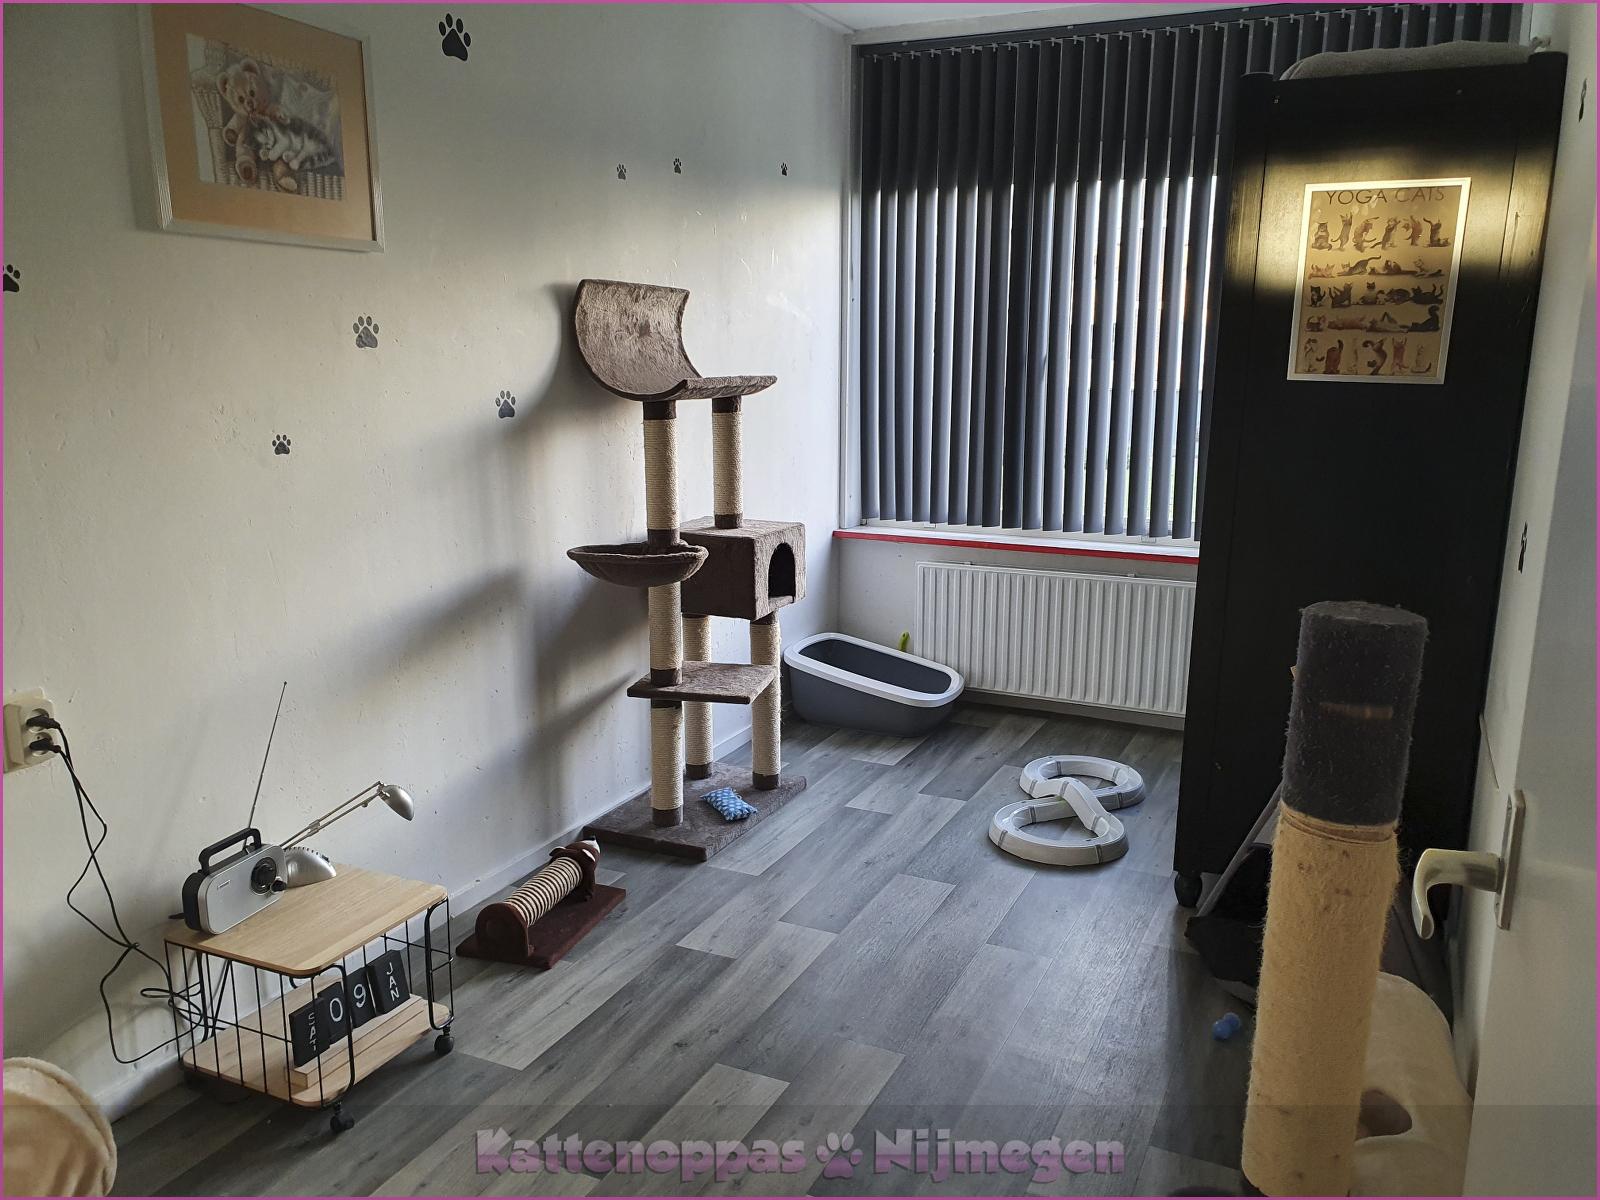 Kamer2: luxe kattenkamer met brede vensterbank!